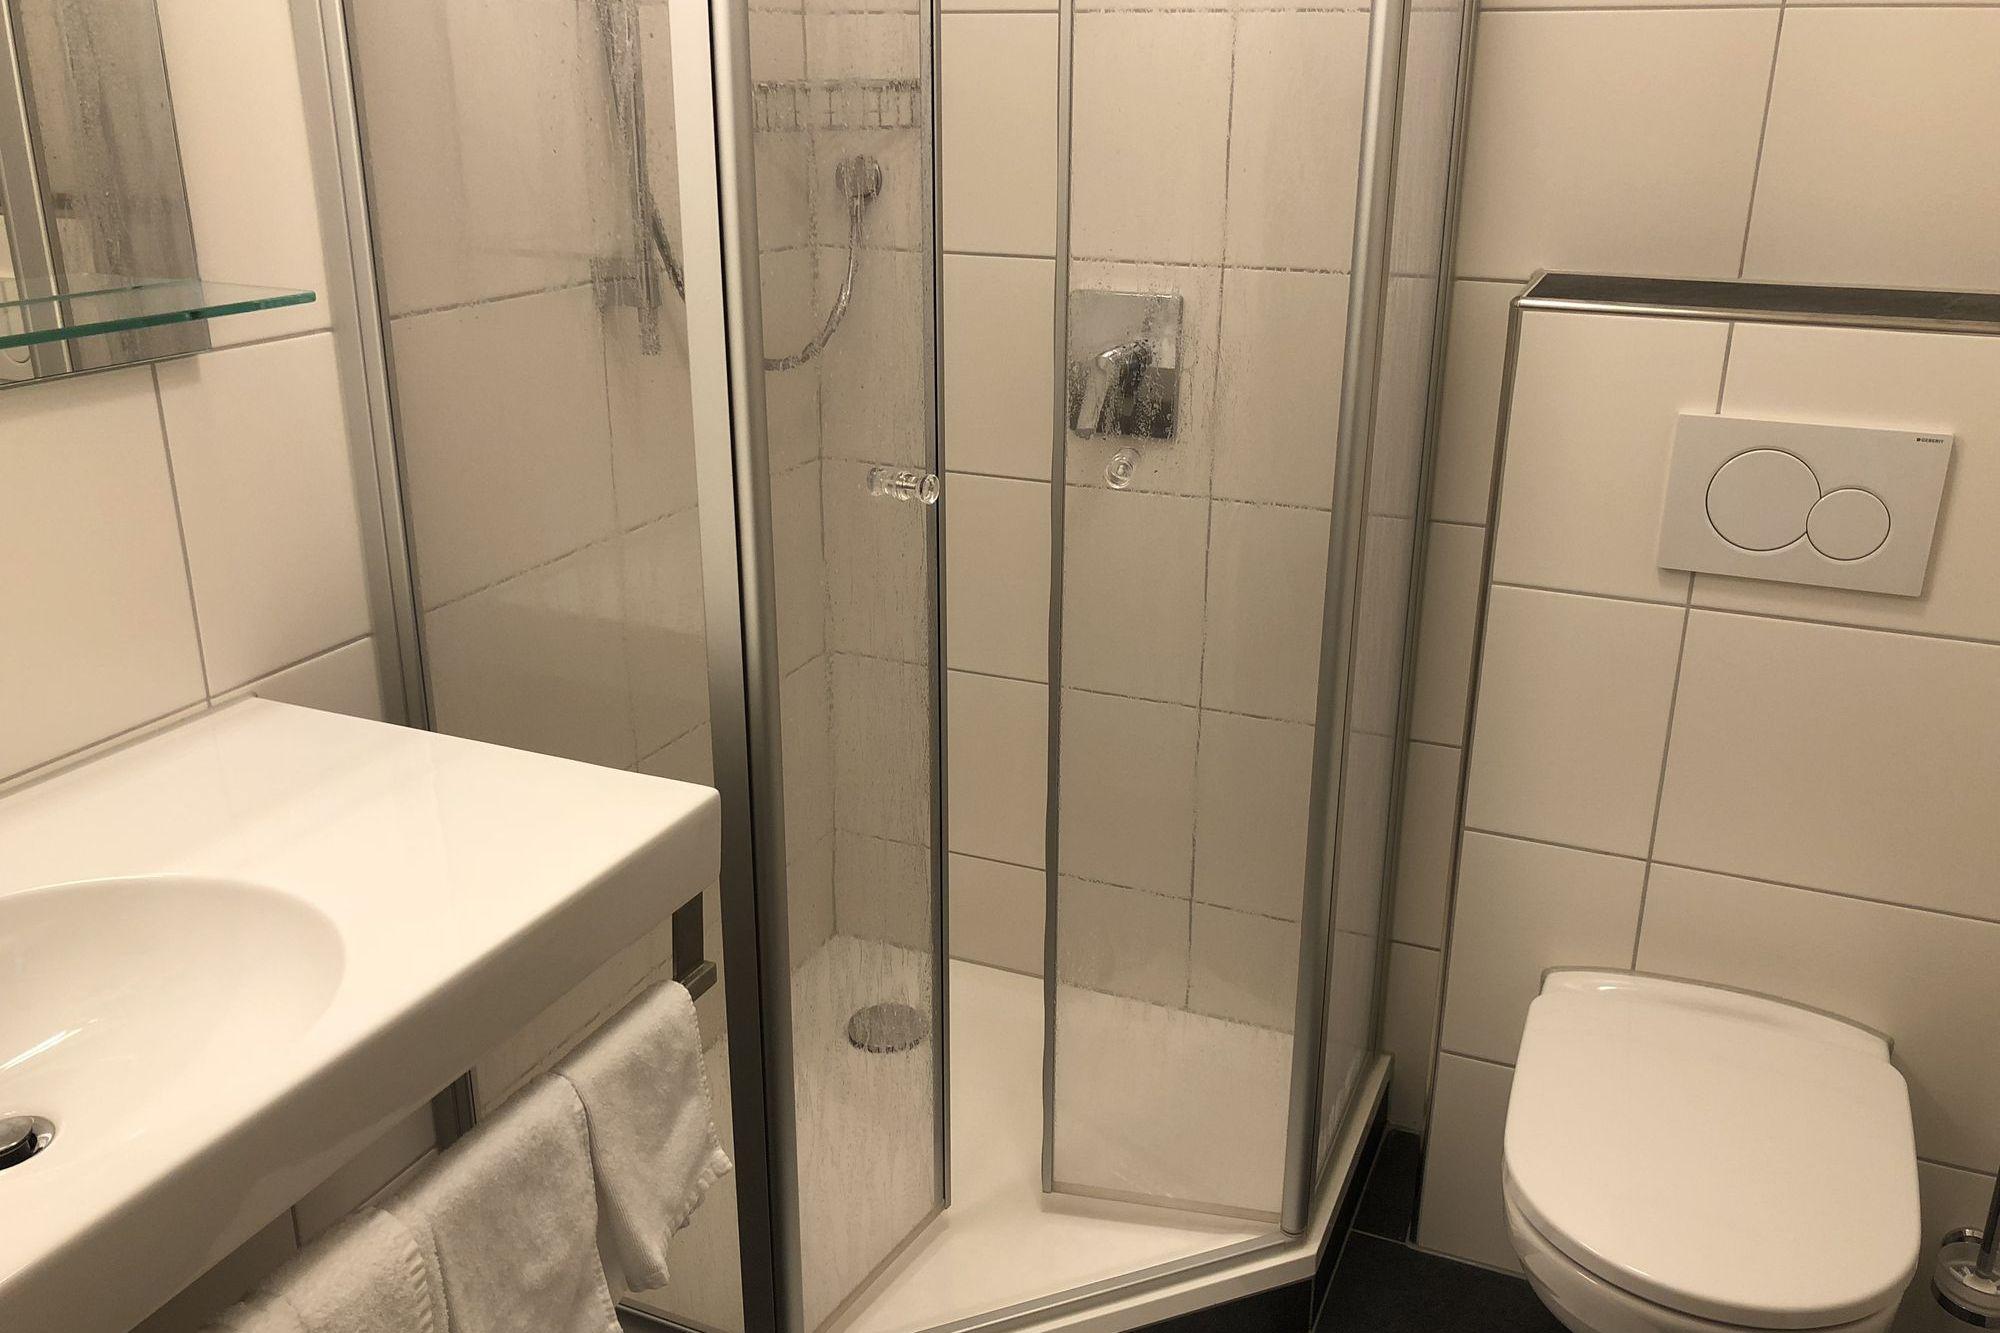 https://www.hotelbinder.de/wp-content/uploads/einzelzimmer1_3.jpg